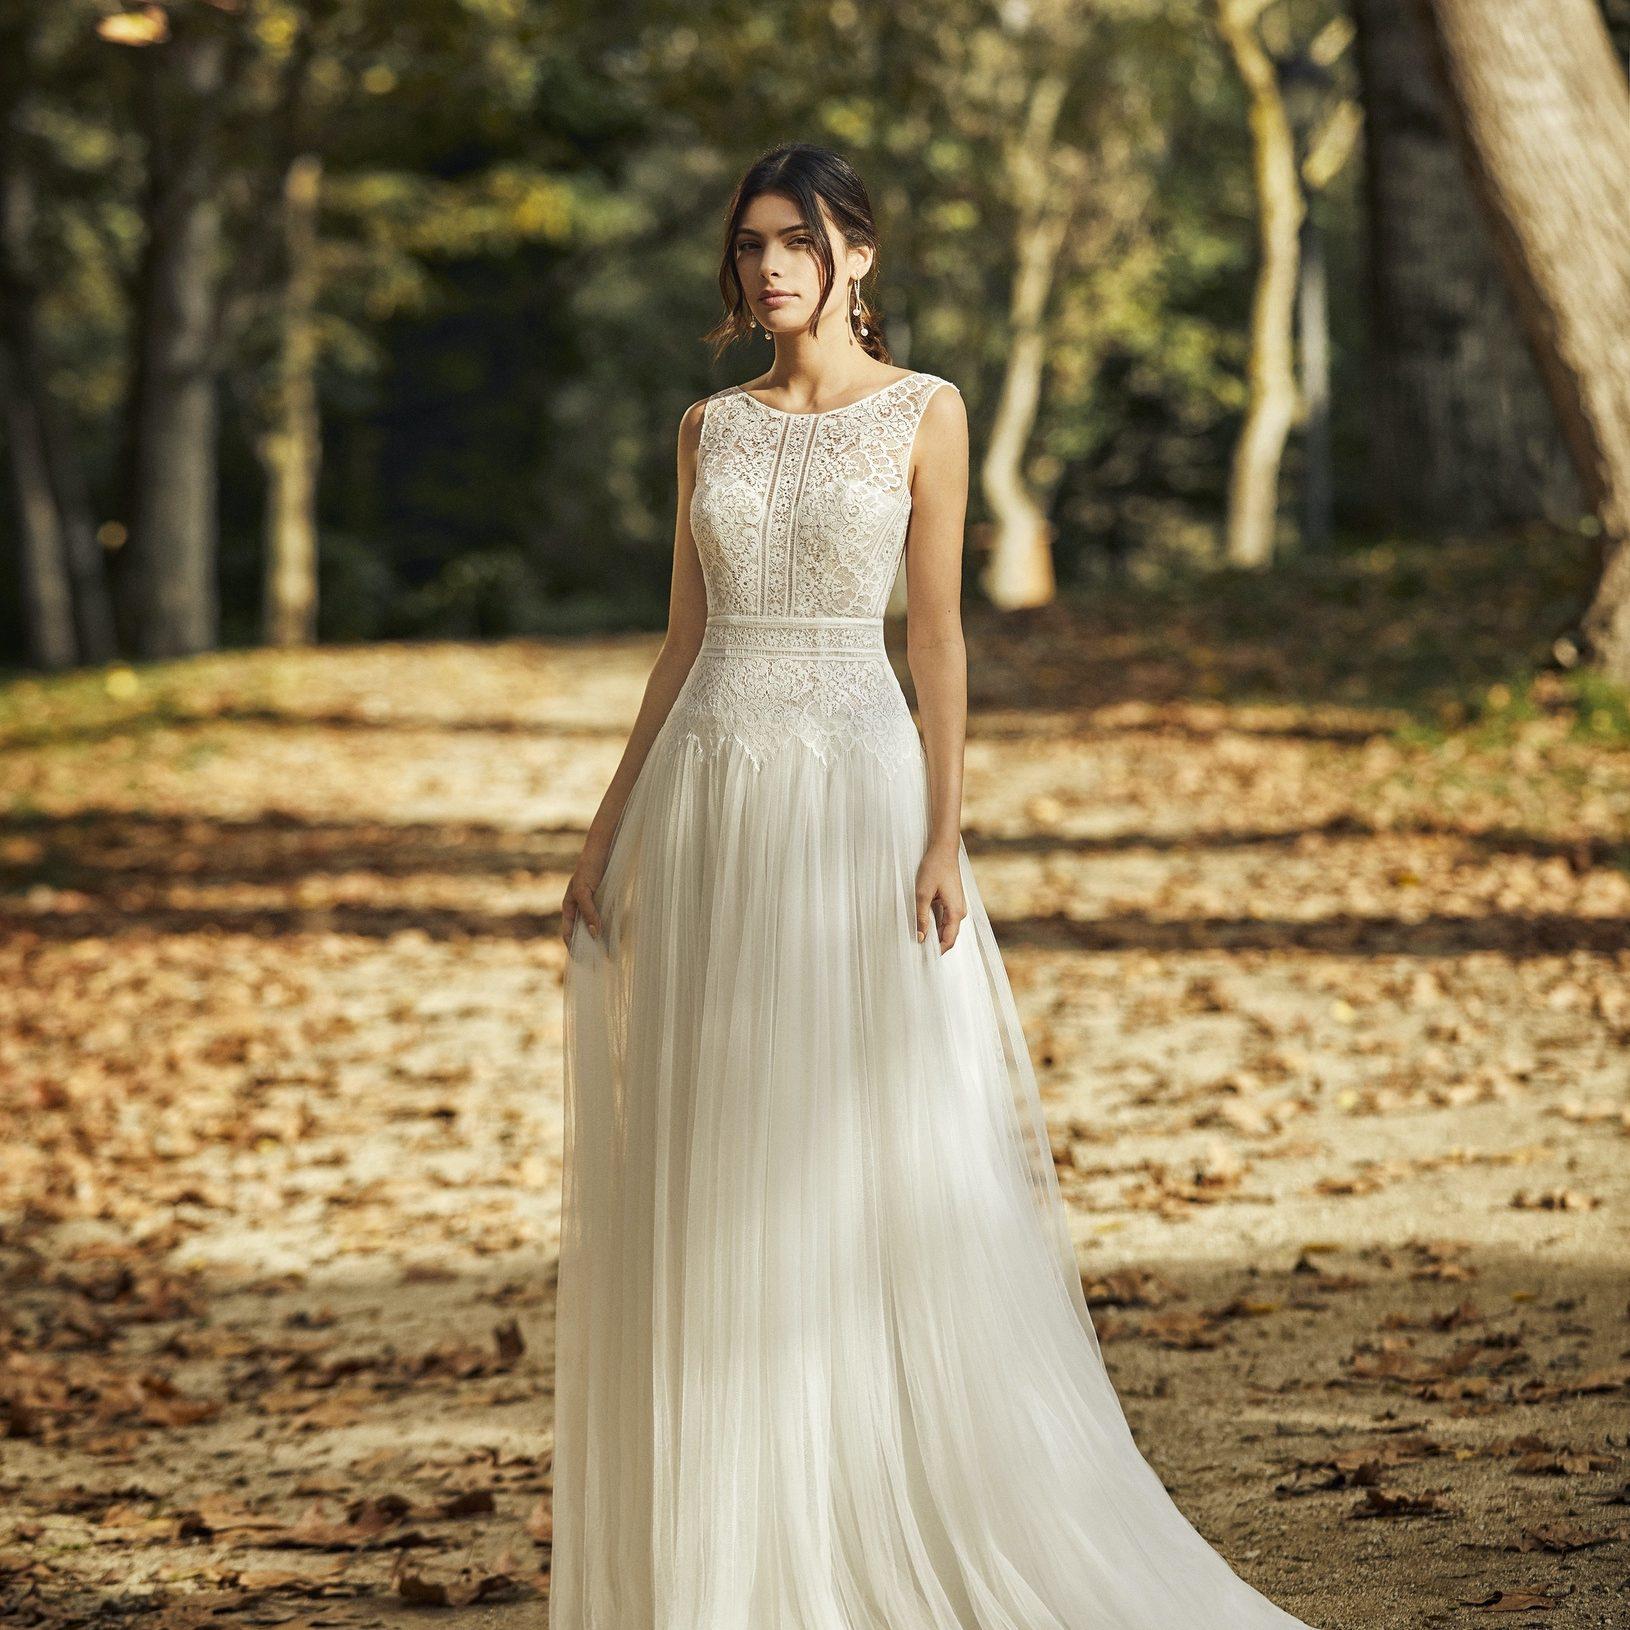 Bridal gown by Alma Novia at Perfect Day Bridal